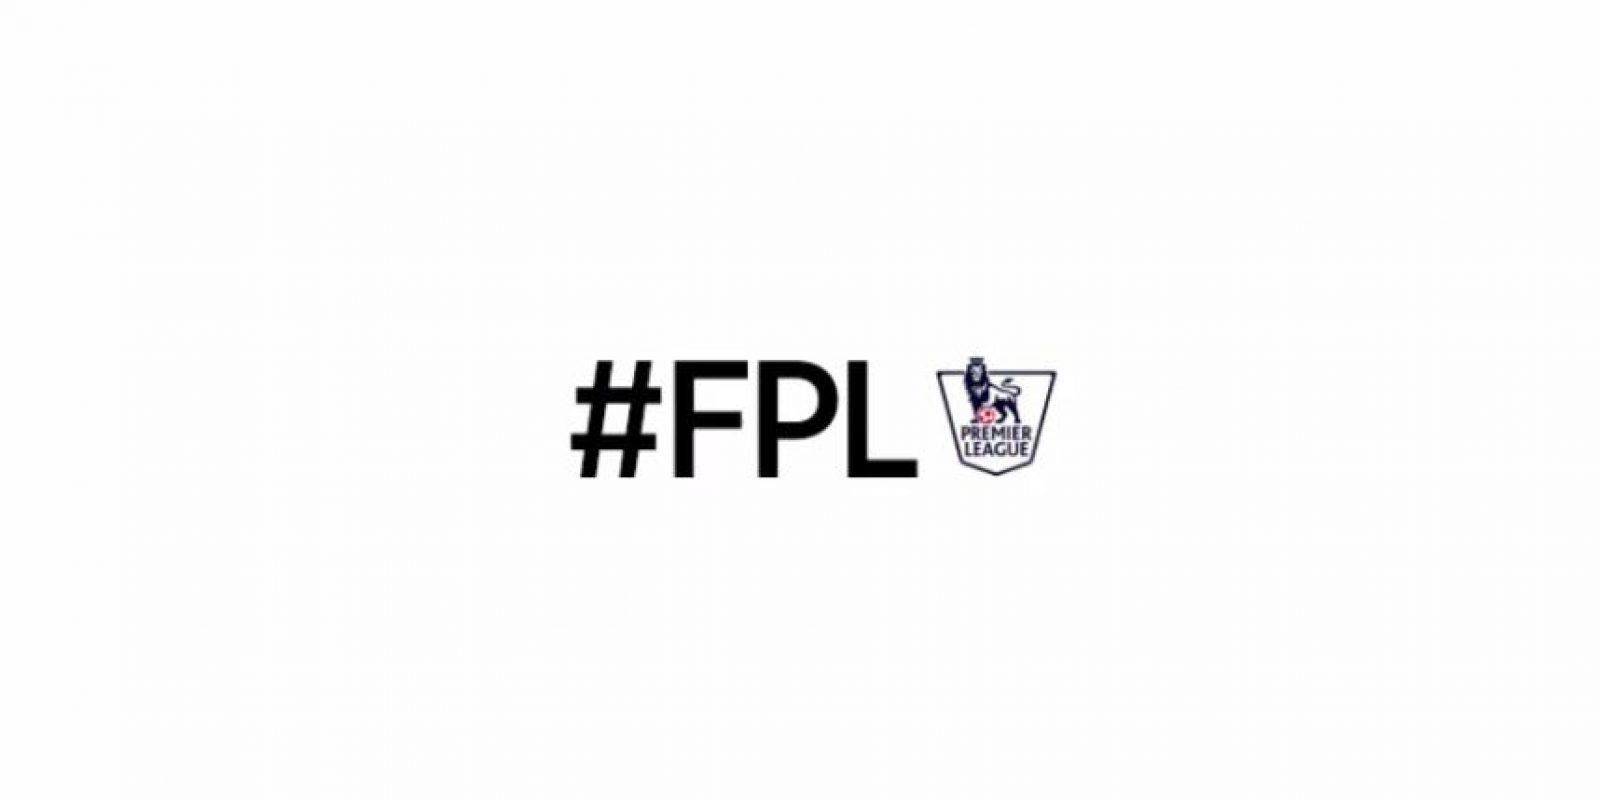 Emoji de la Futbol Premier League. Foto:Twitter